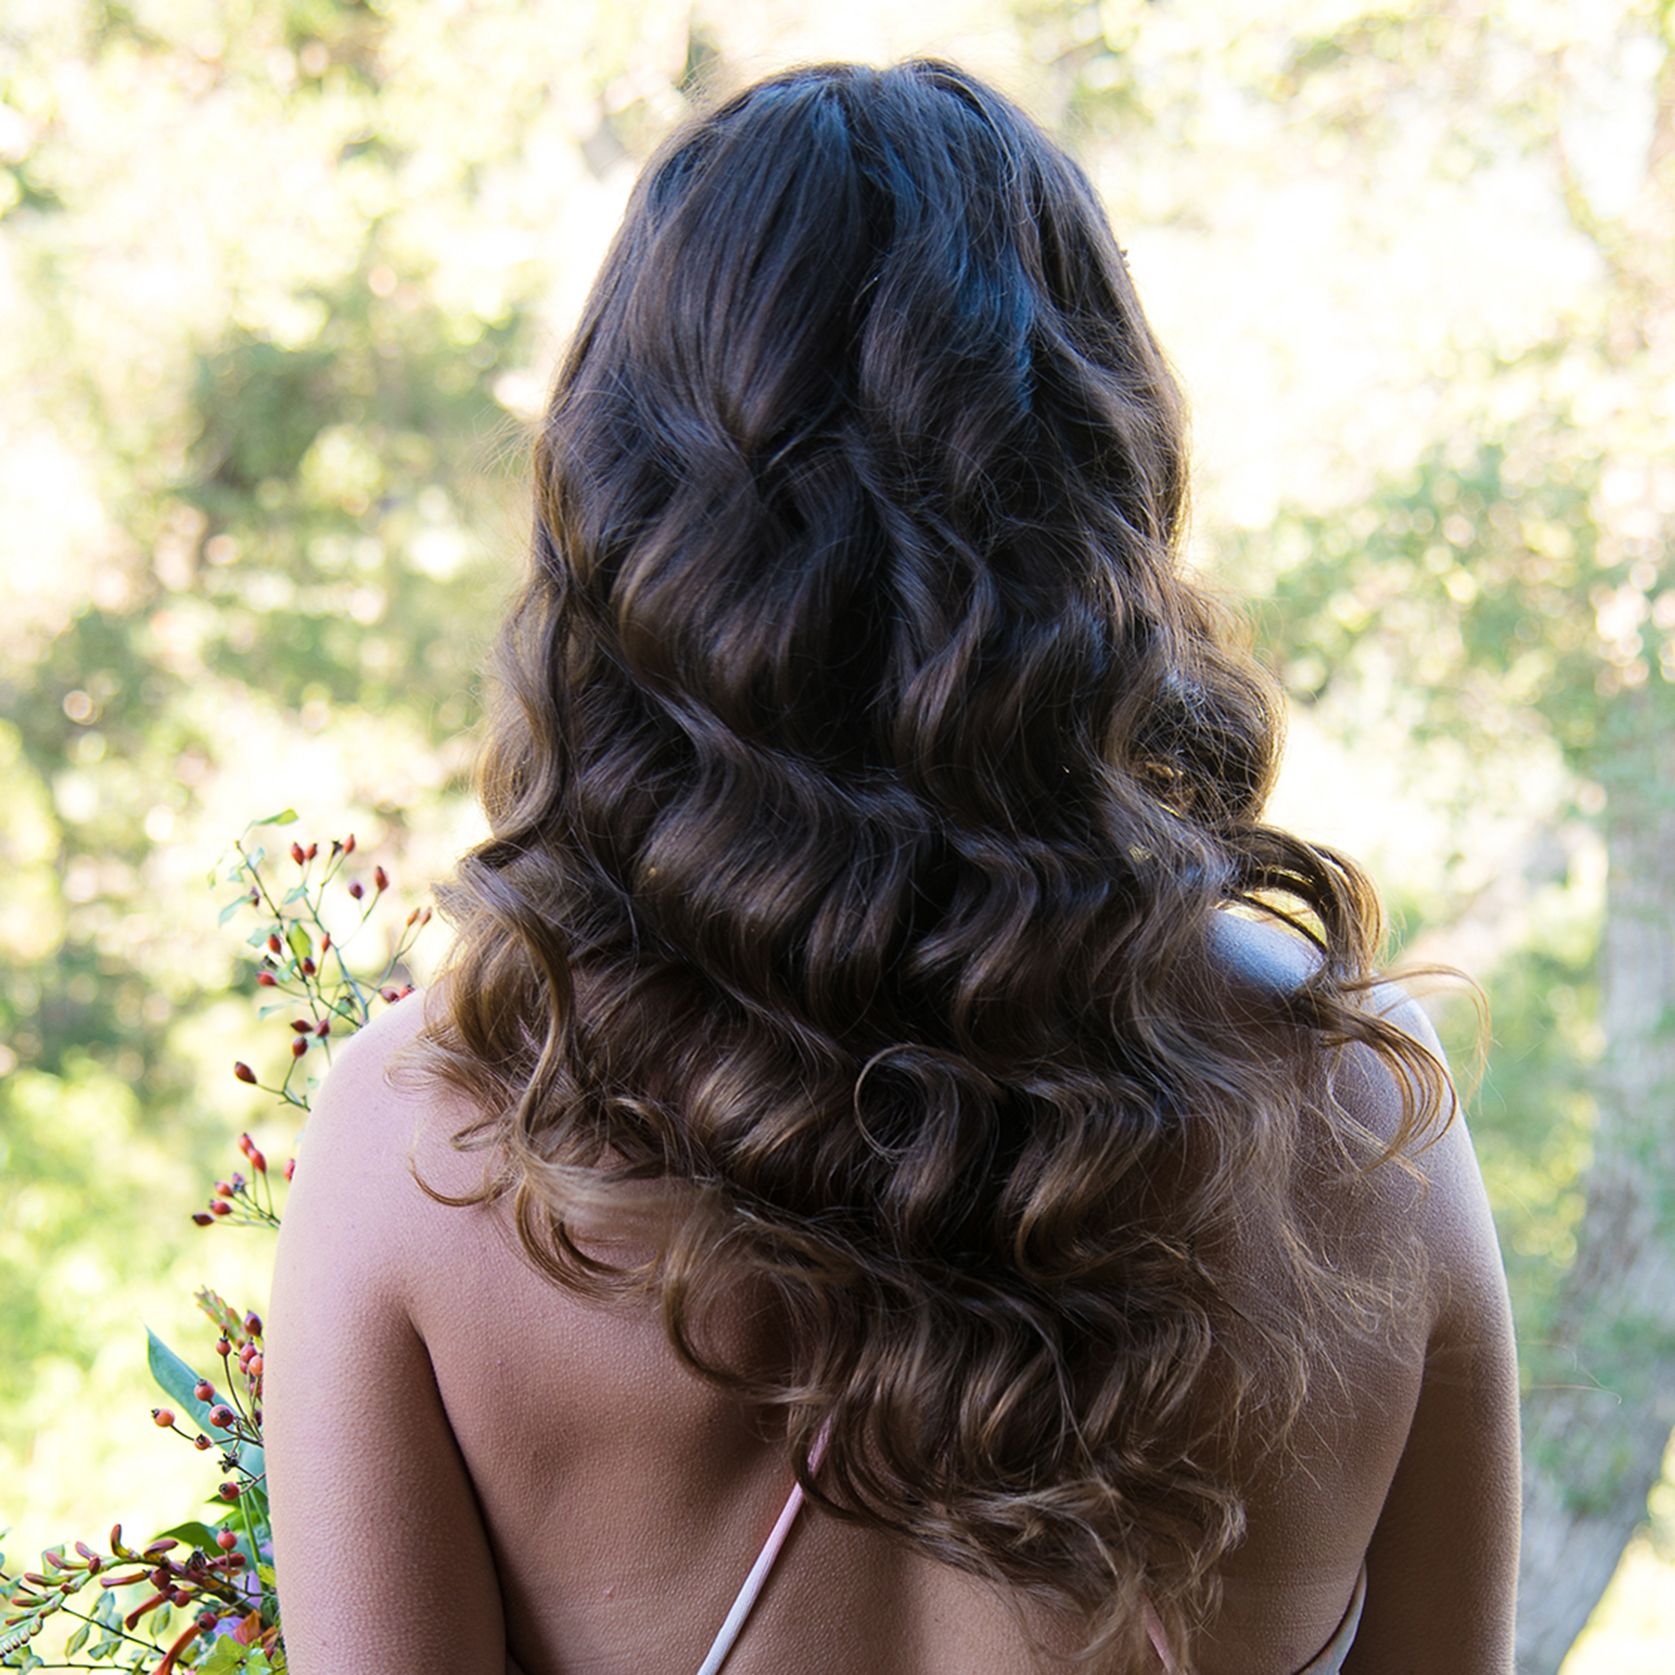 Isabella-back of hair-square.jpg